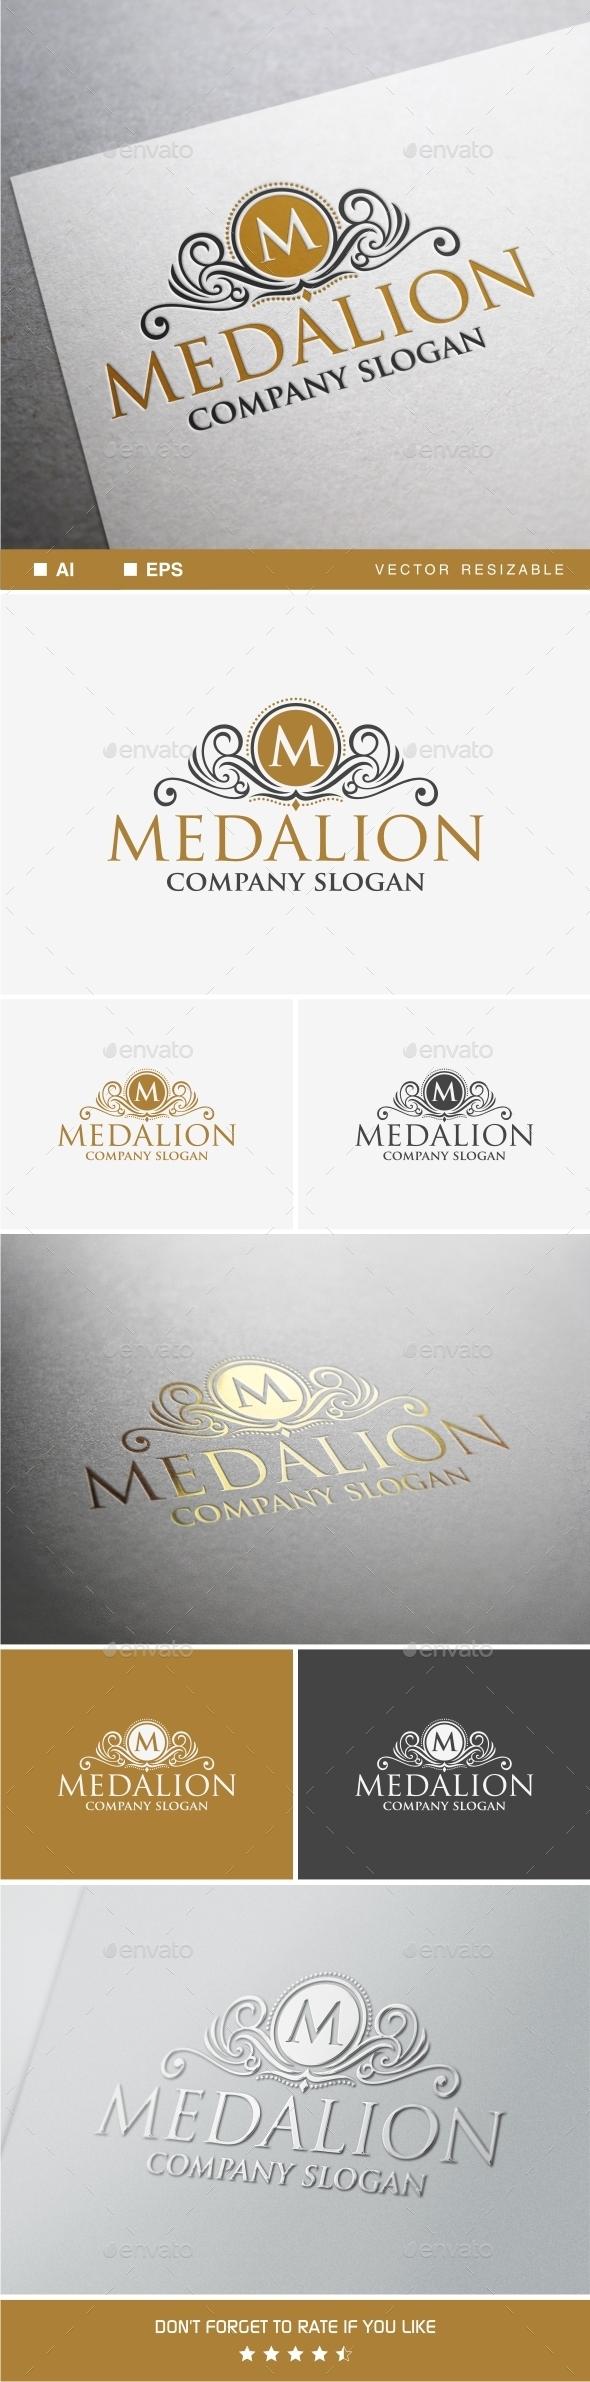 GraphicRiver Medallion Logo Template 9935219